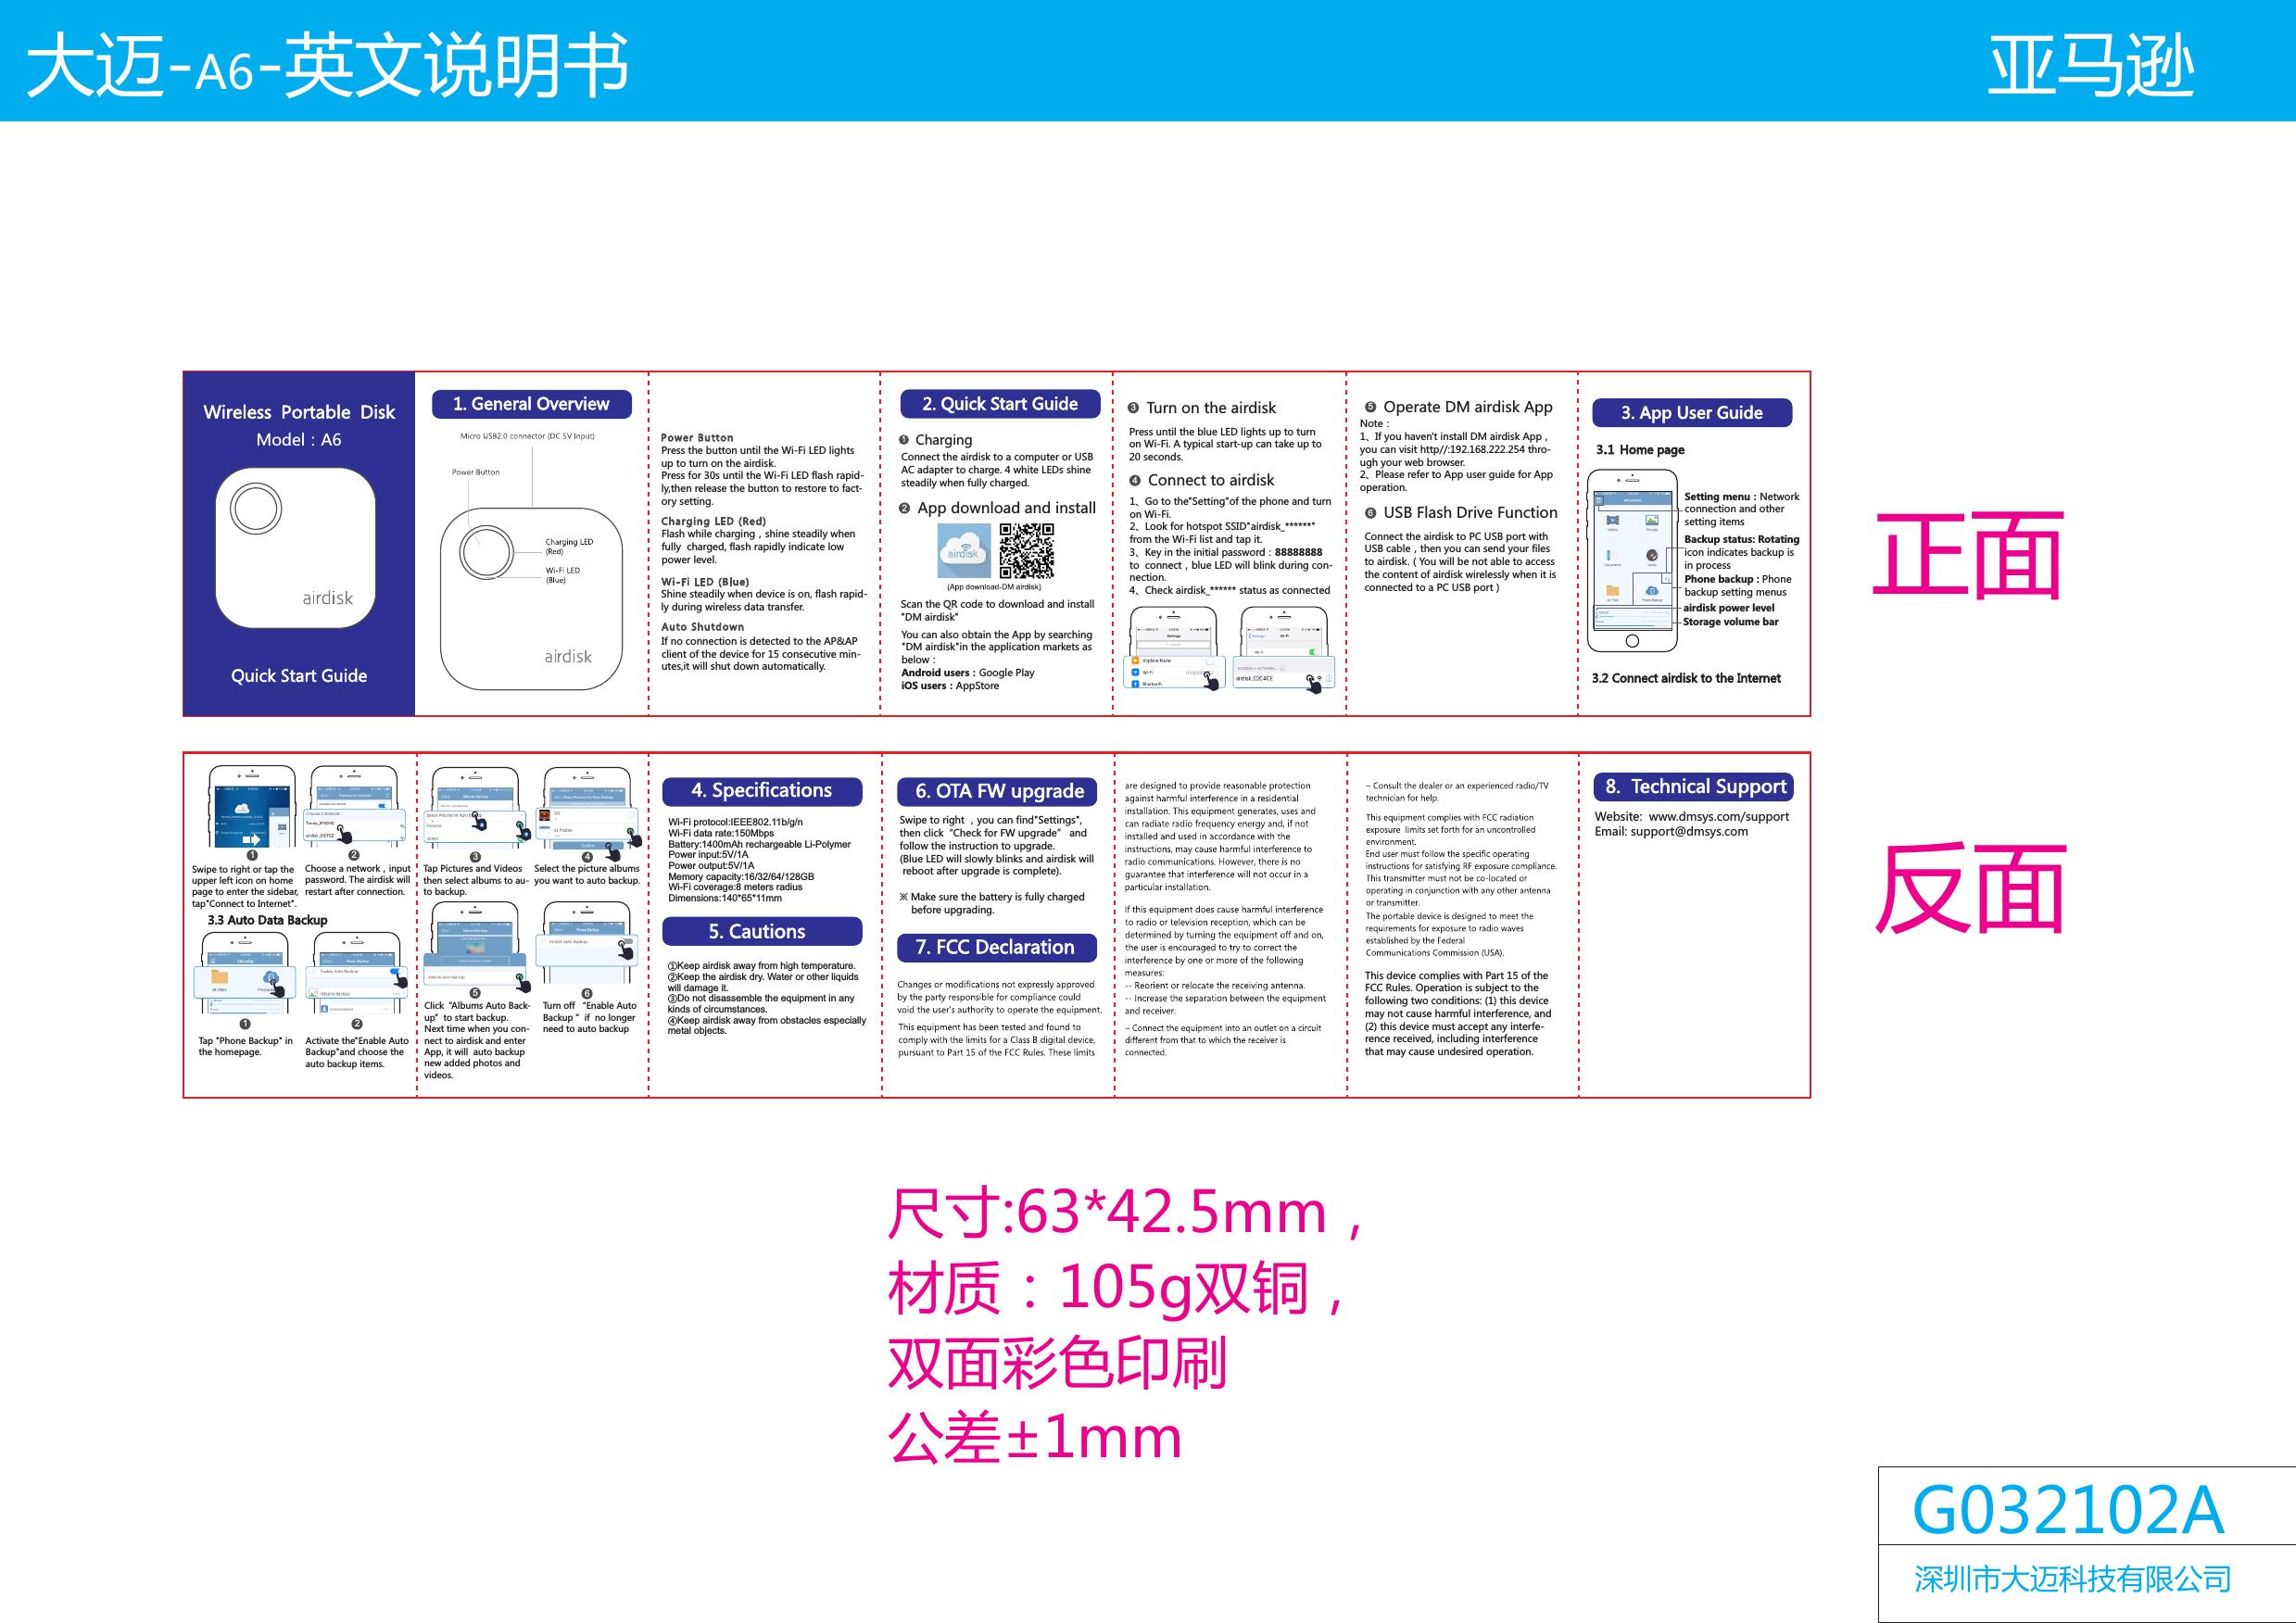 Damai Technology A6 Wireless Portable Disk User Manual 1